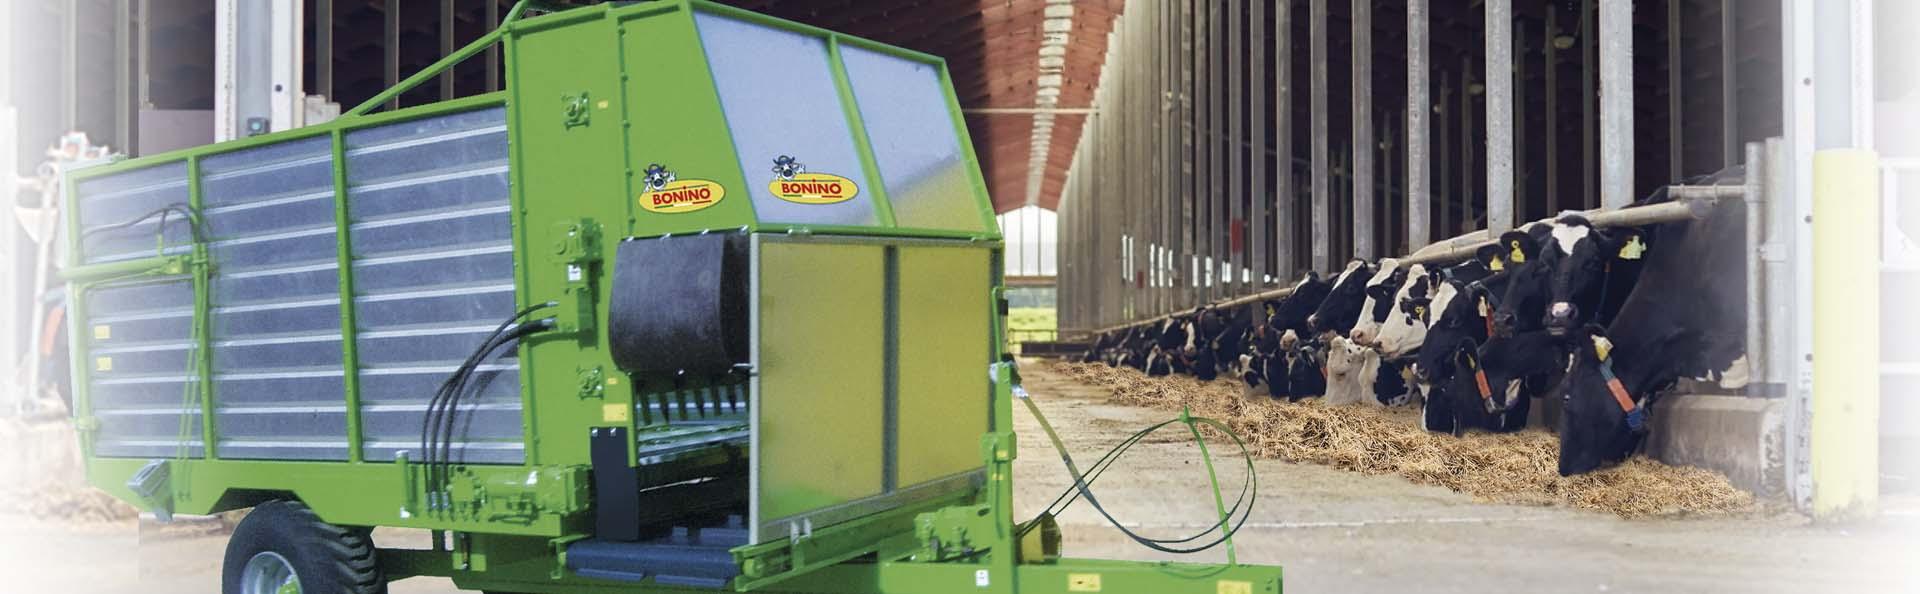 Bonino-carri-foraggeri-forage-wagons-remorque-fourragère-distributrice